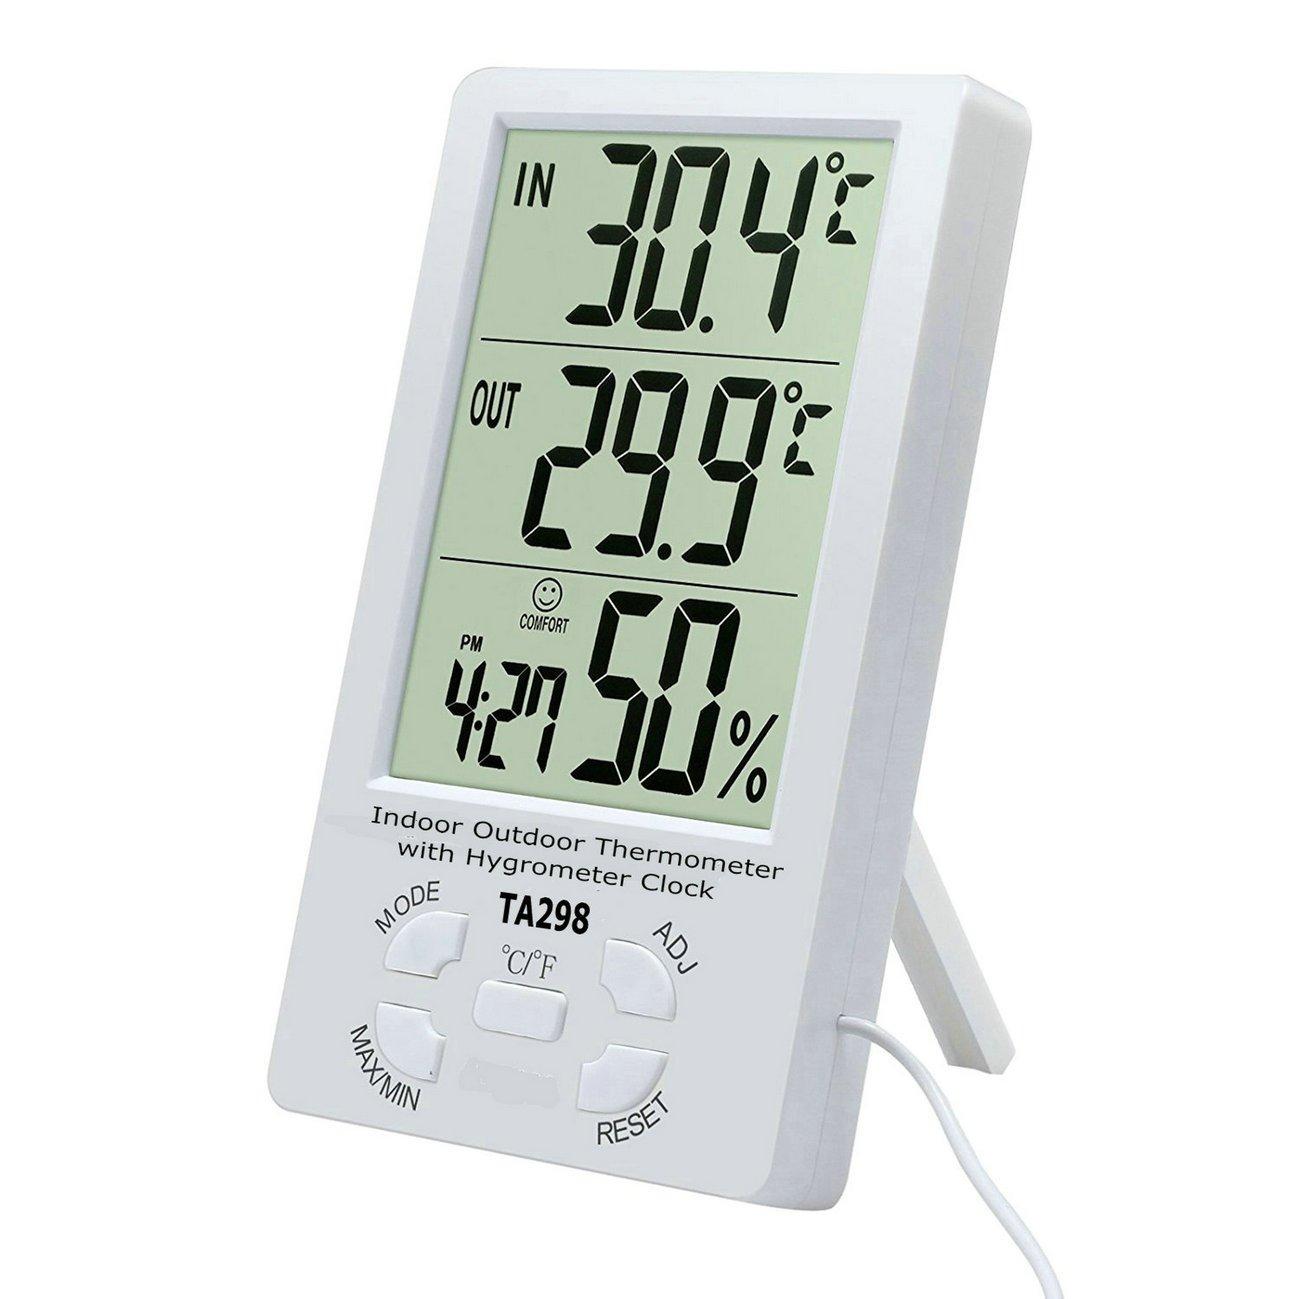 GuDoQi Digital LCD Termómetro Exterior De Interior Con Sensor De Reloj Higrómetro Min/Max Cable Del Sensor: Amazon.es: Hogar